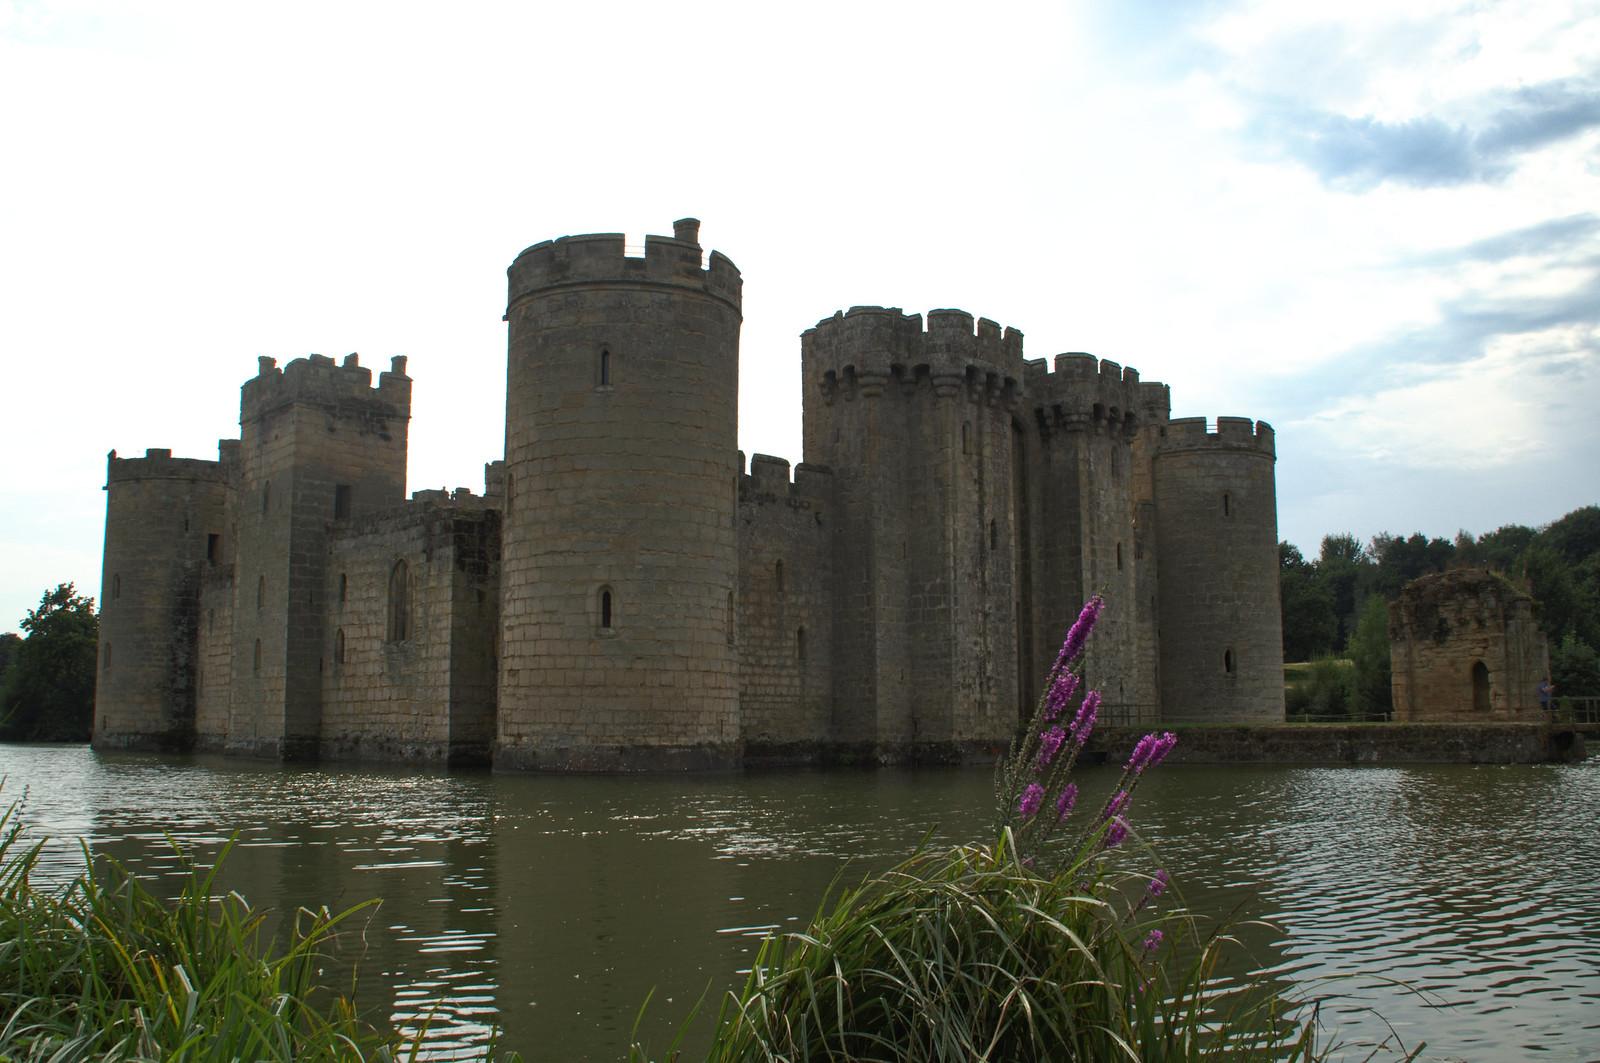 Bodiam Castle moat